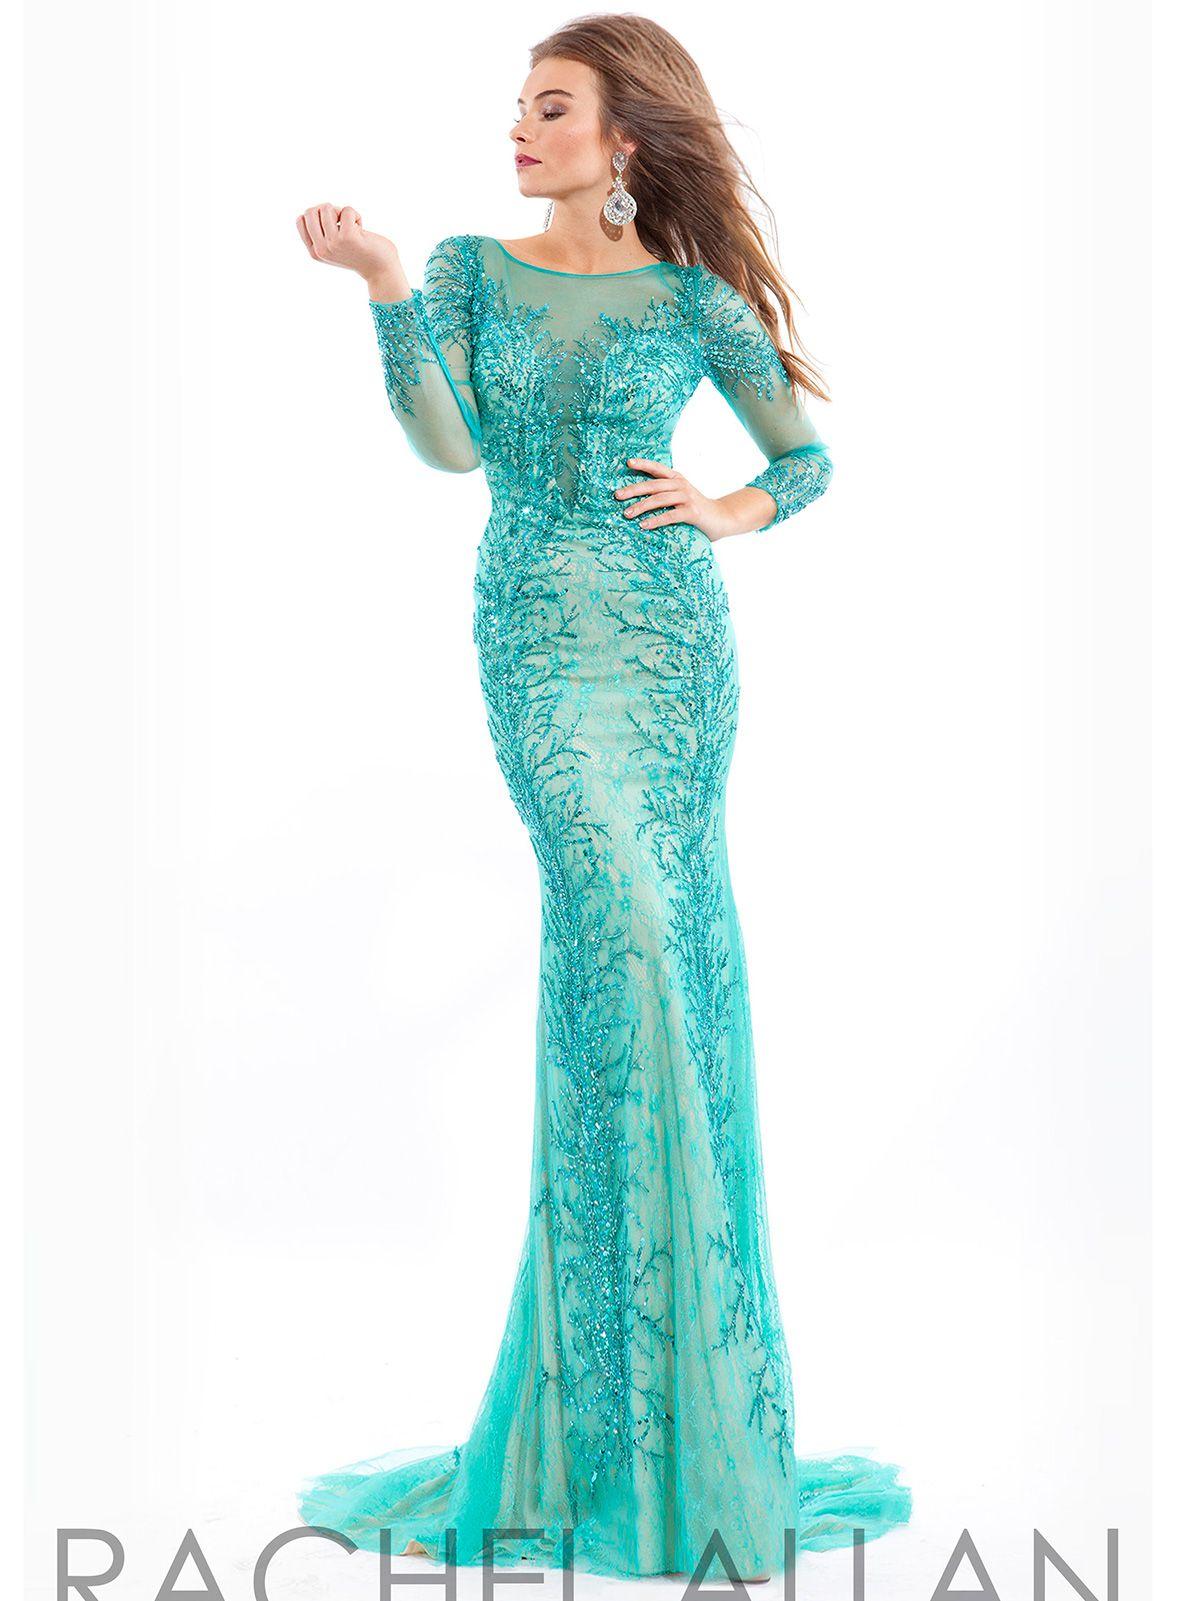 Fustana 2015 modele te fustanave 2015 dresses 2015 fustana modele te - Fustana 2015 Modele Te Fustanave 2015 Dresses 2015 Fustana Modele Te 8